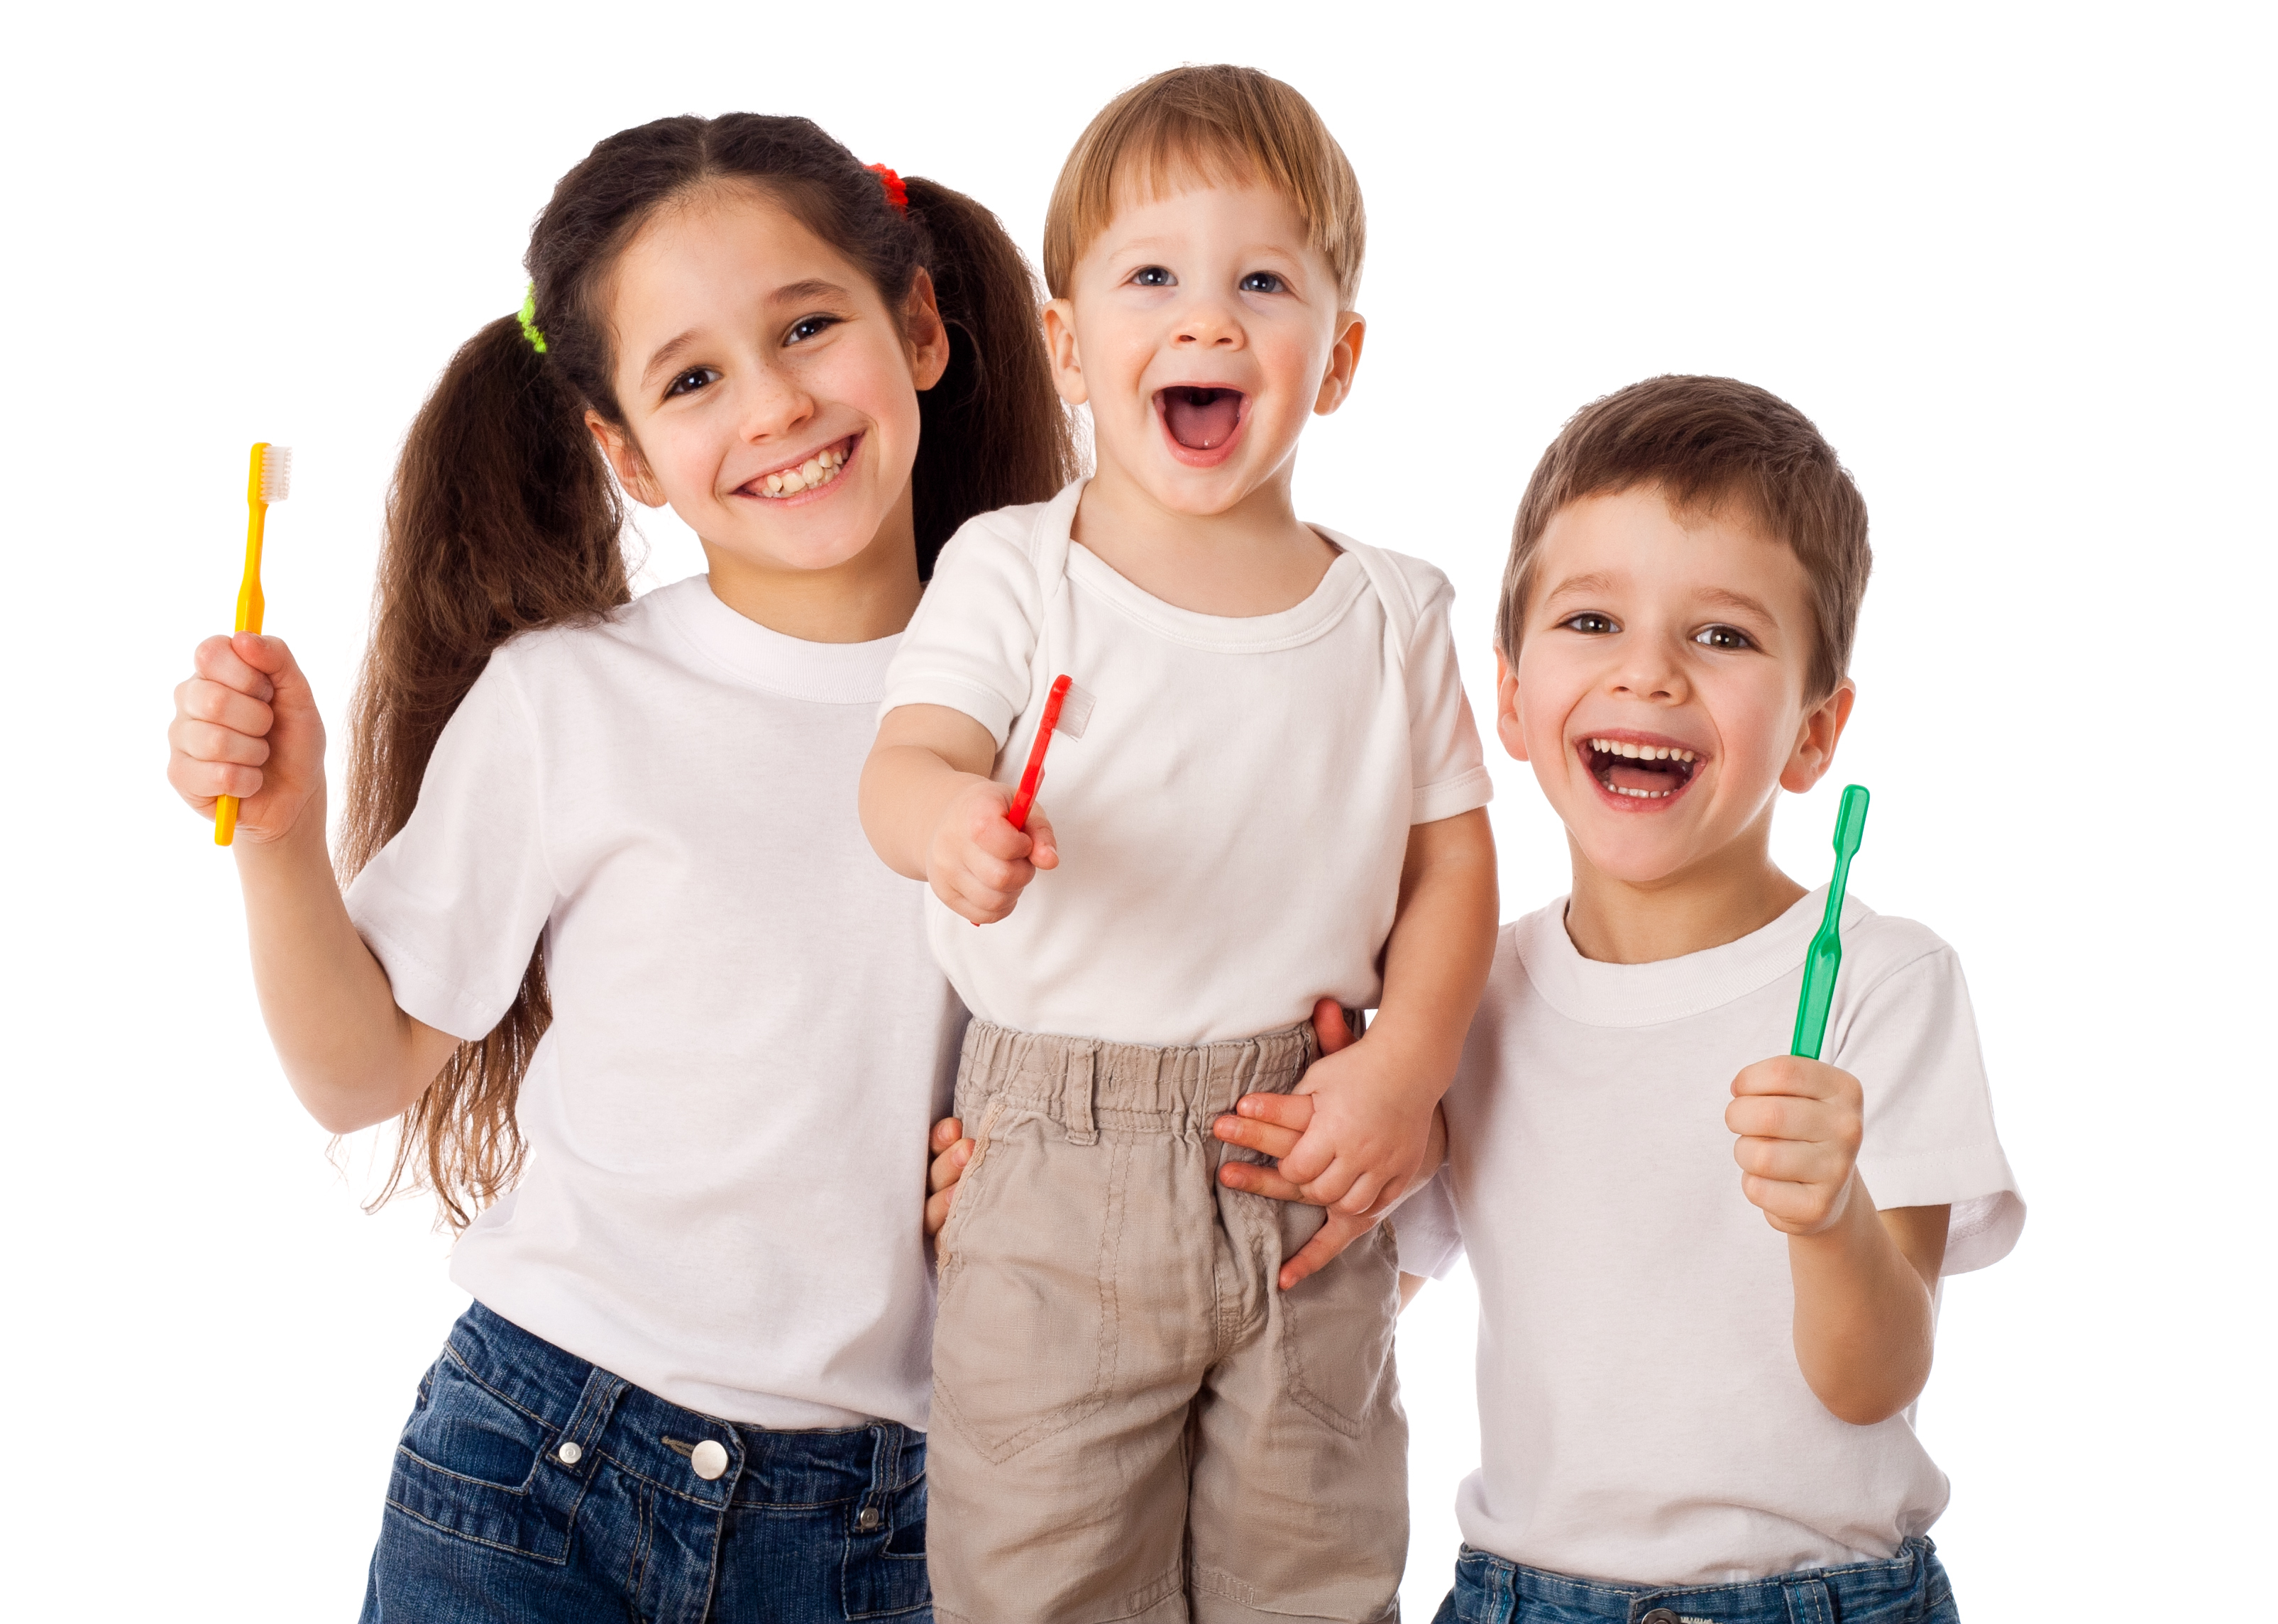 Pediatric Dentist Washington, DC